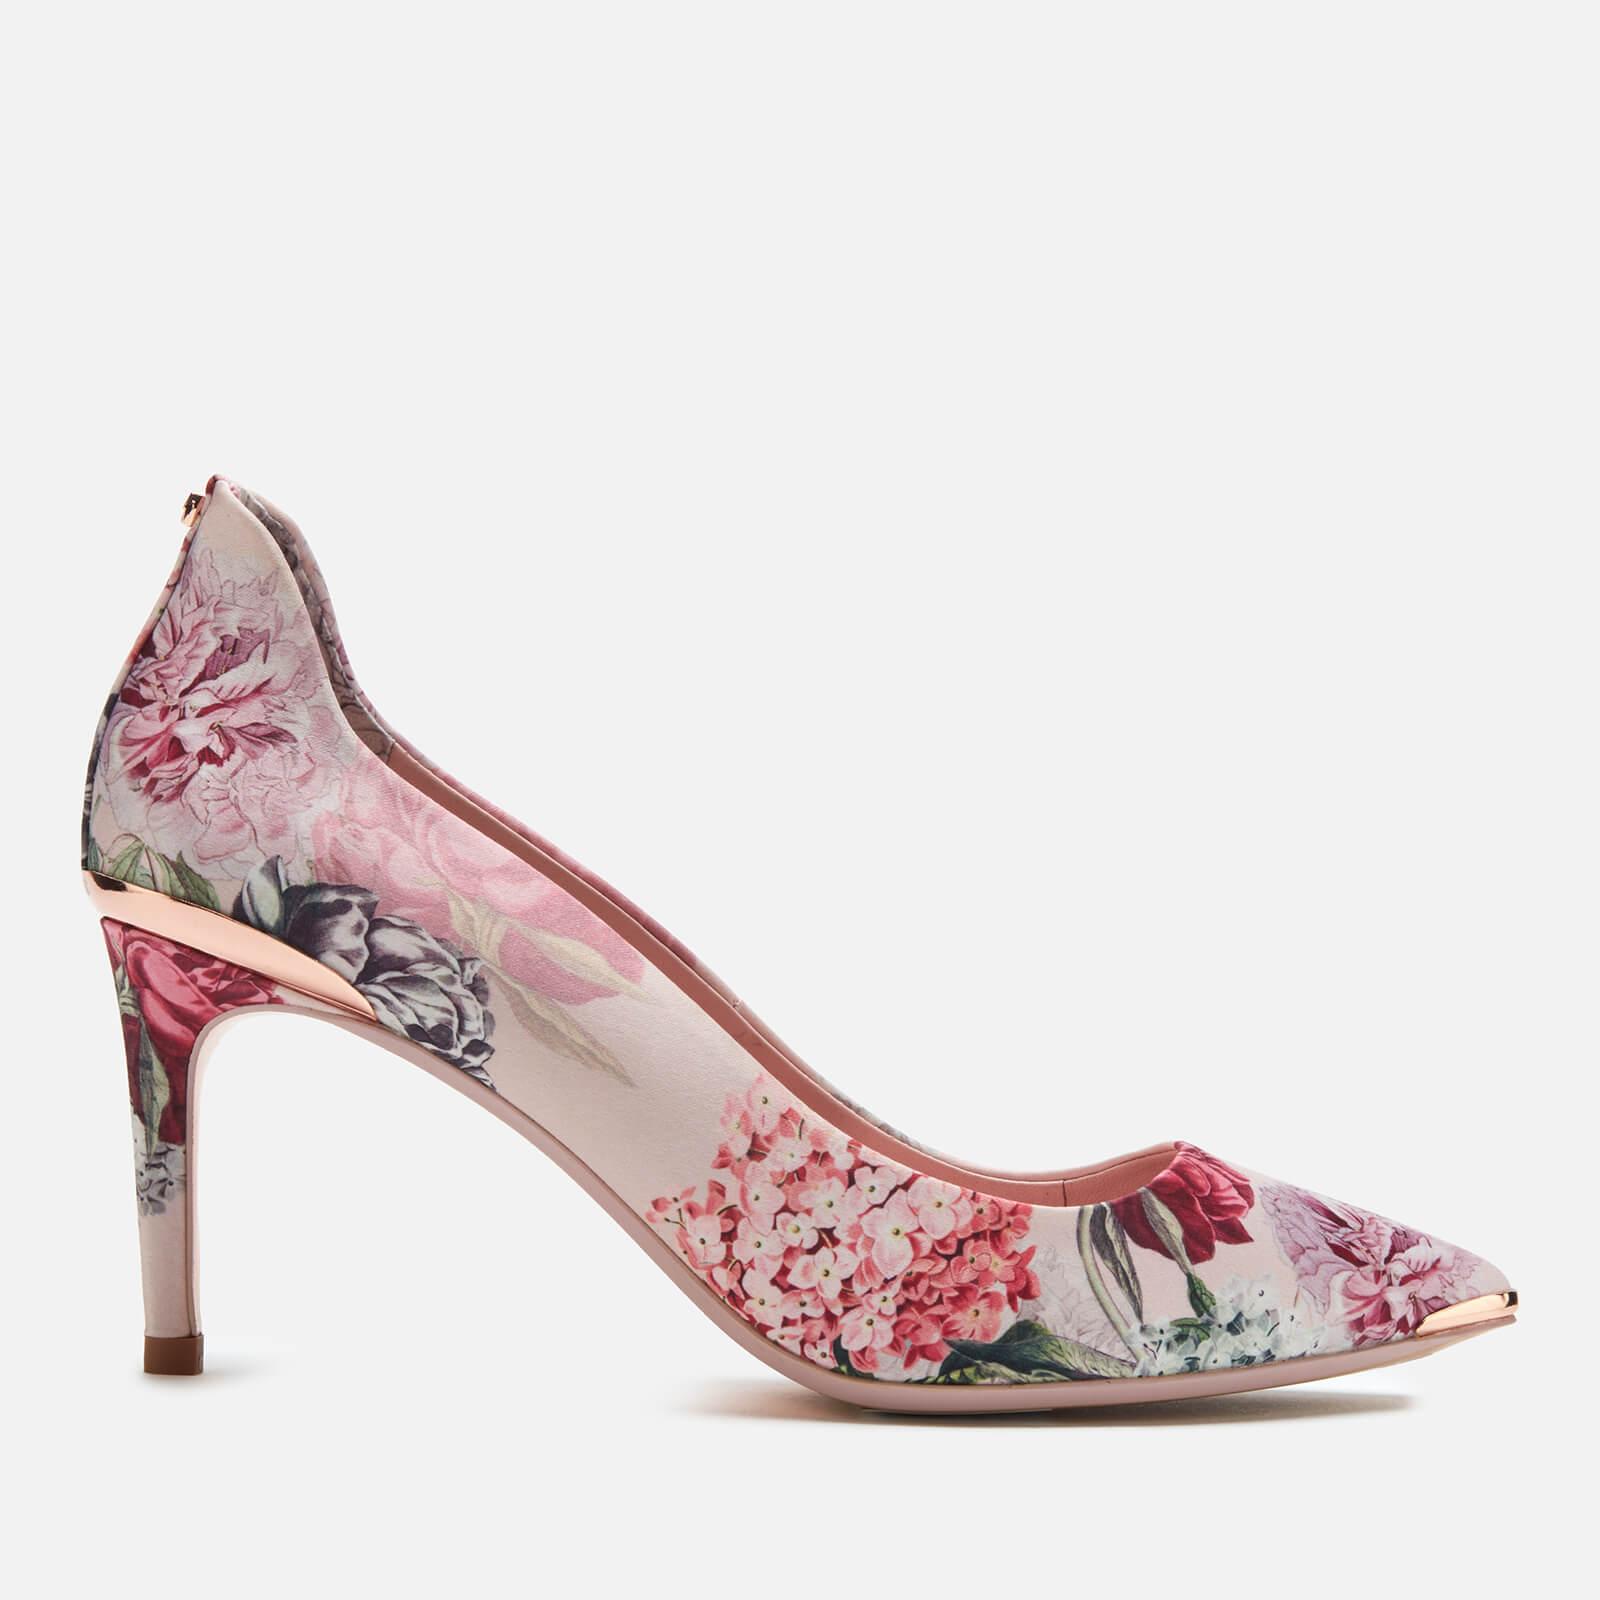 Ted Baker Women's Vyixin Court Shoes - Light Pink - UK 4